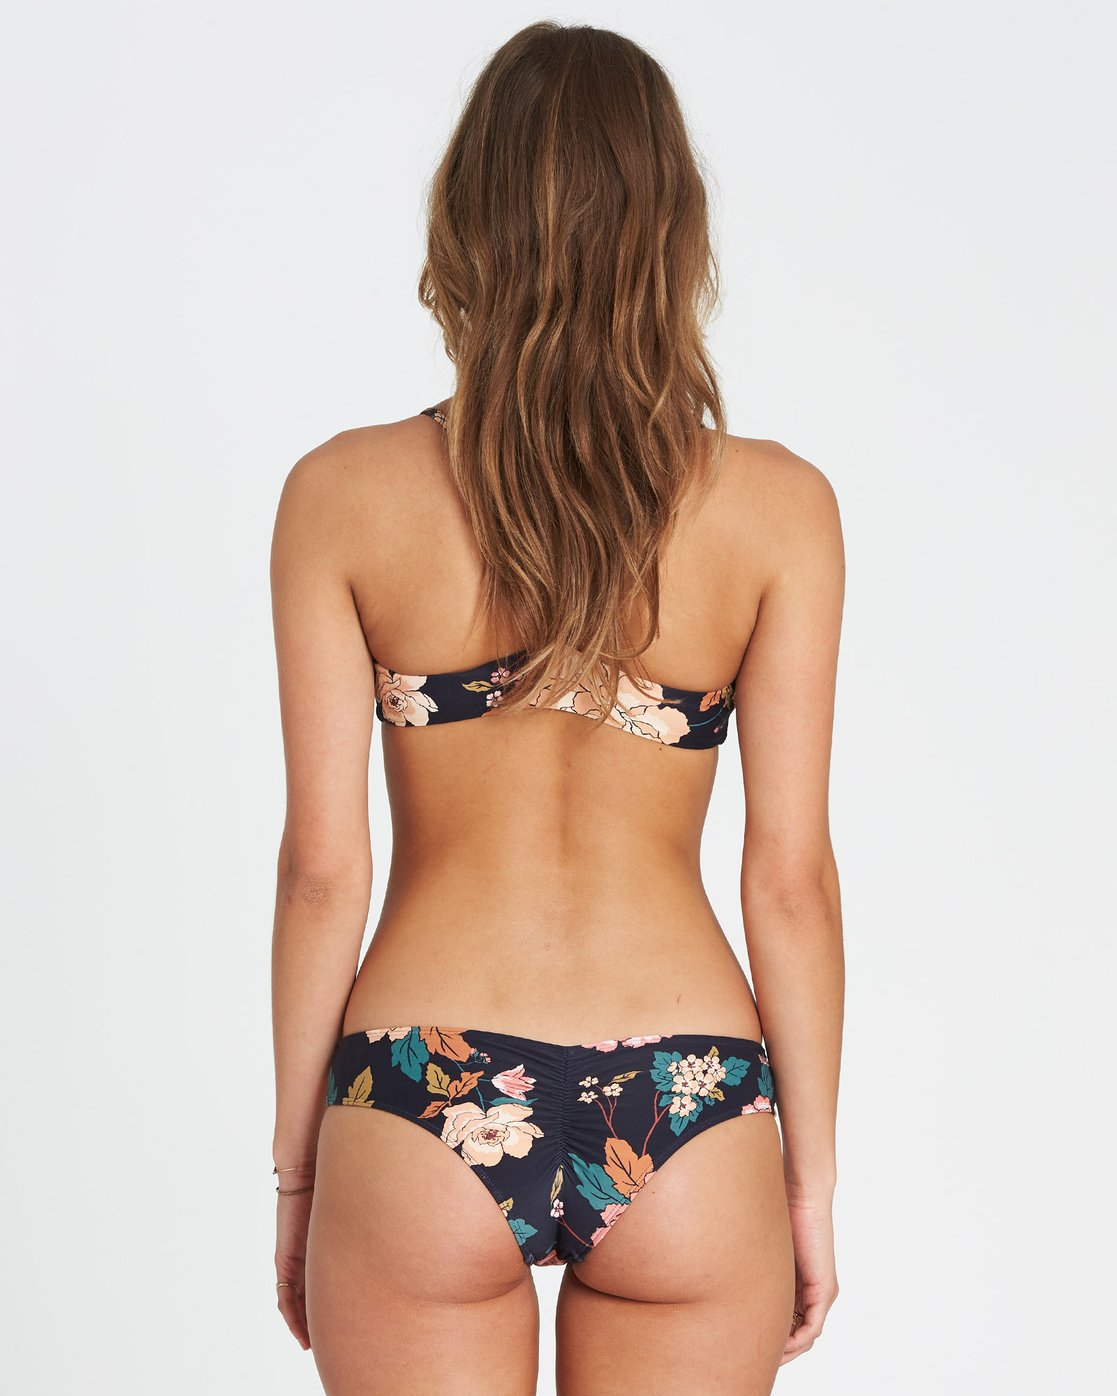 b0ad480ea76b0 Linger on hawaii lo cheeky bikini bottom black sbli billabong jpg 1117x1396 Cheeky  swimsuit bottoms